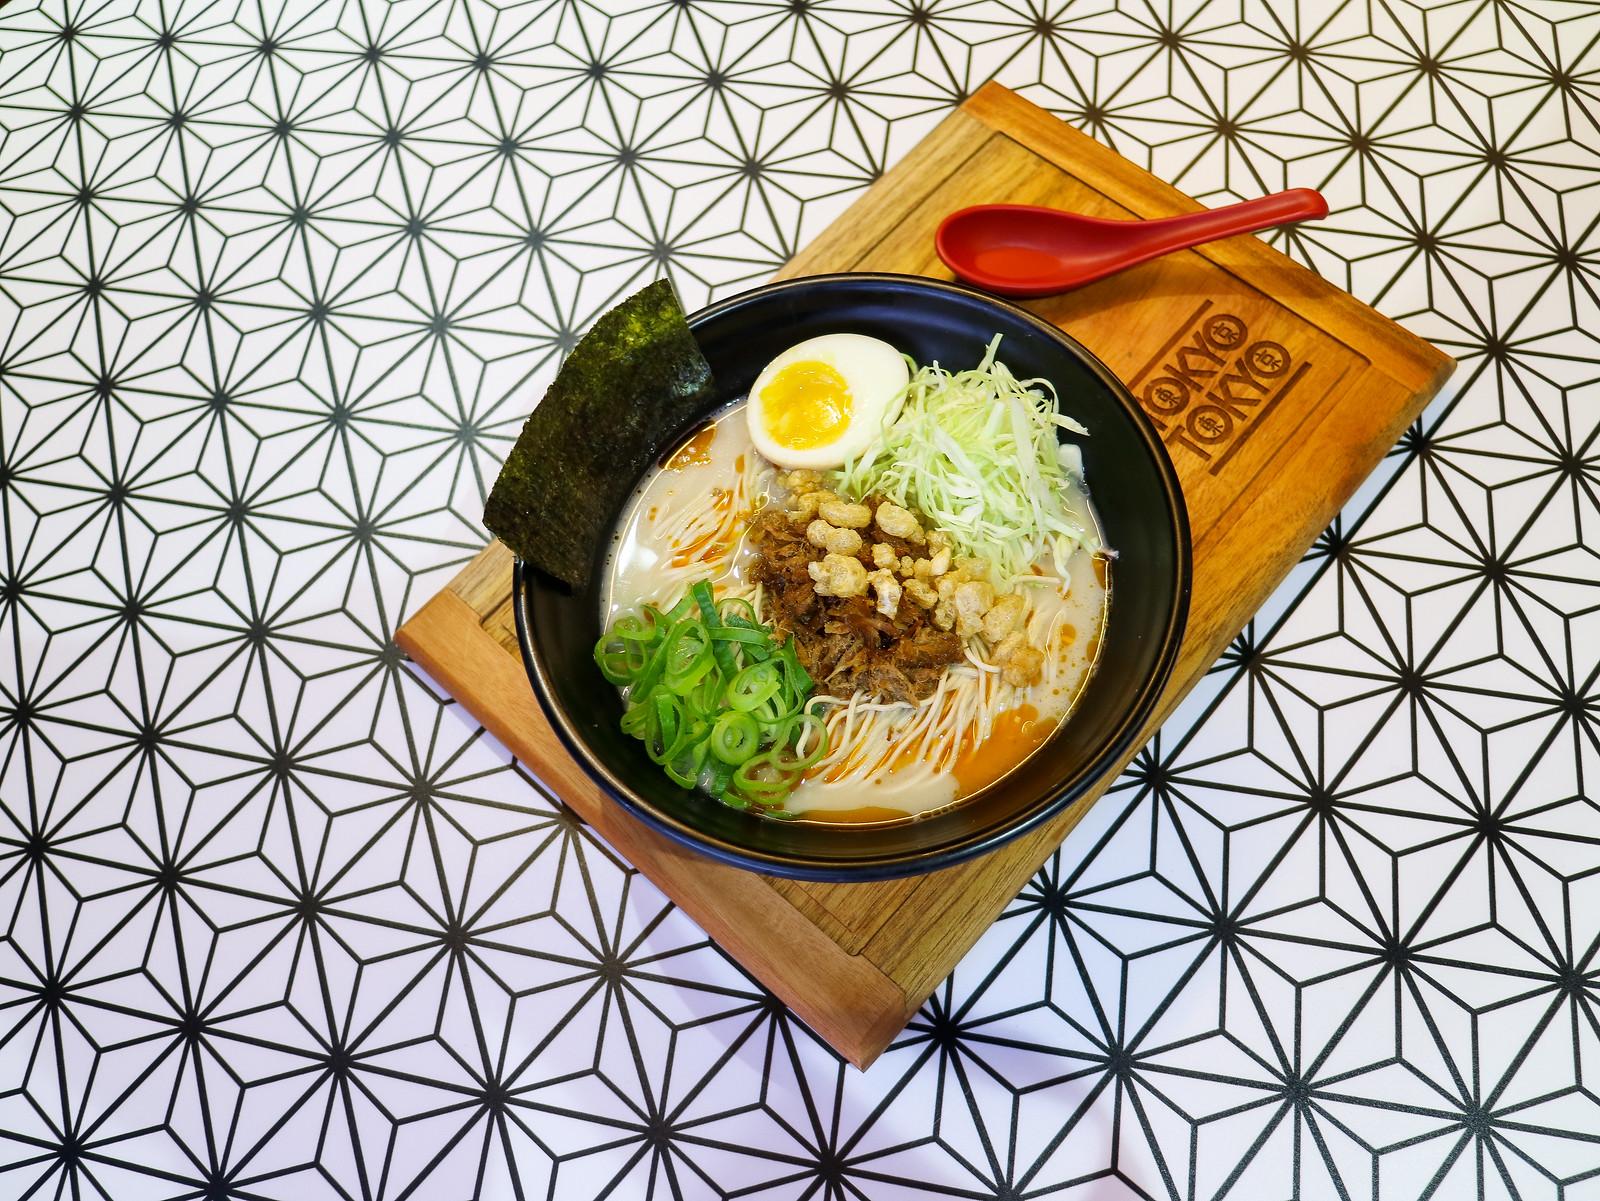 sisig ramen tokyo tokyo (21 of 45)